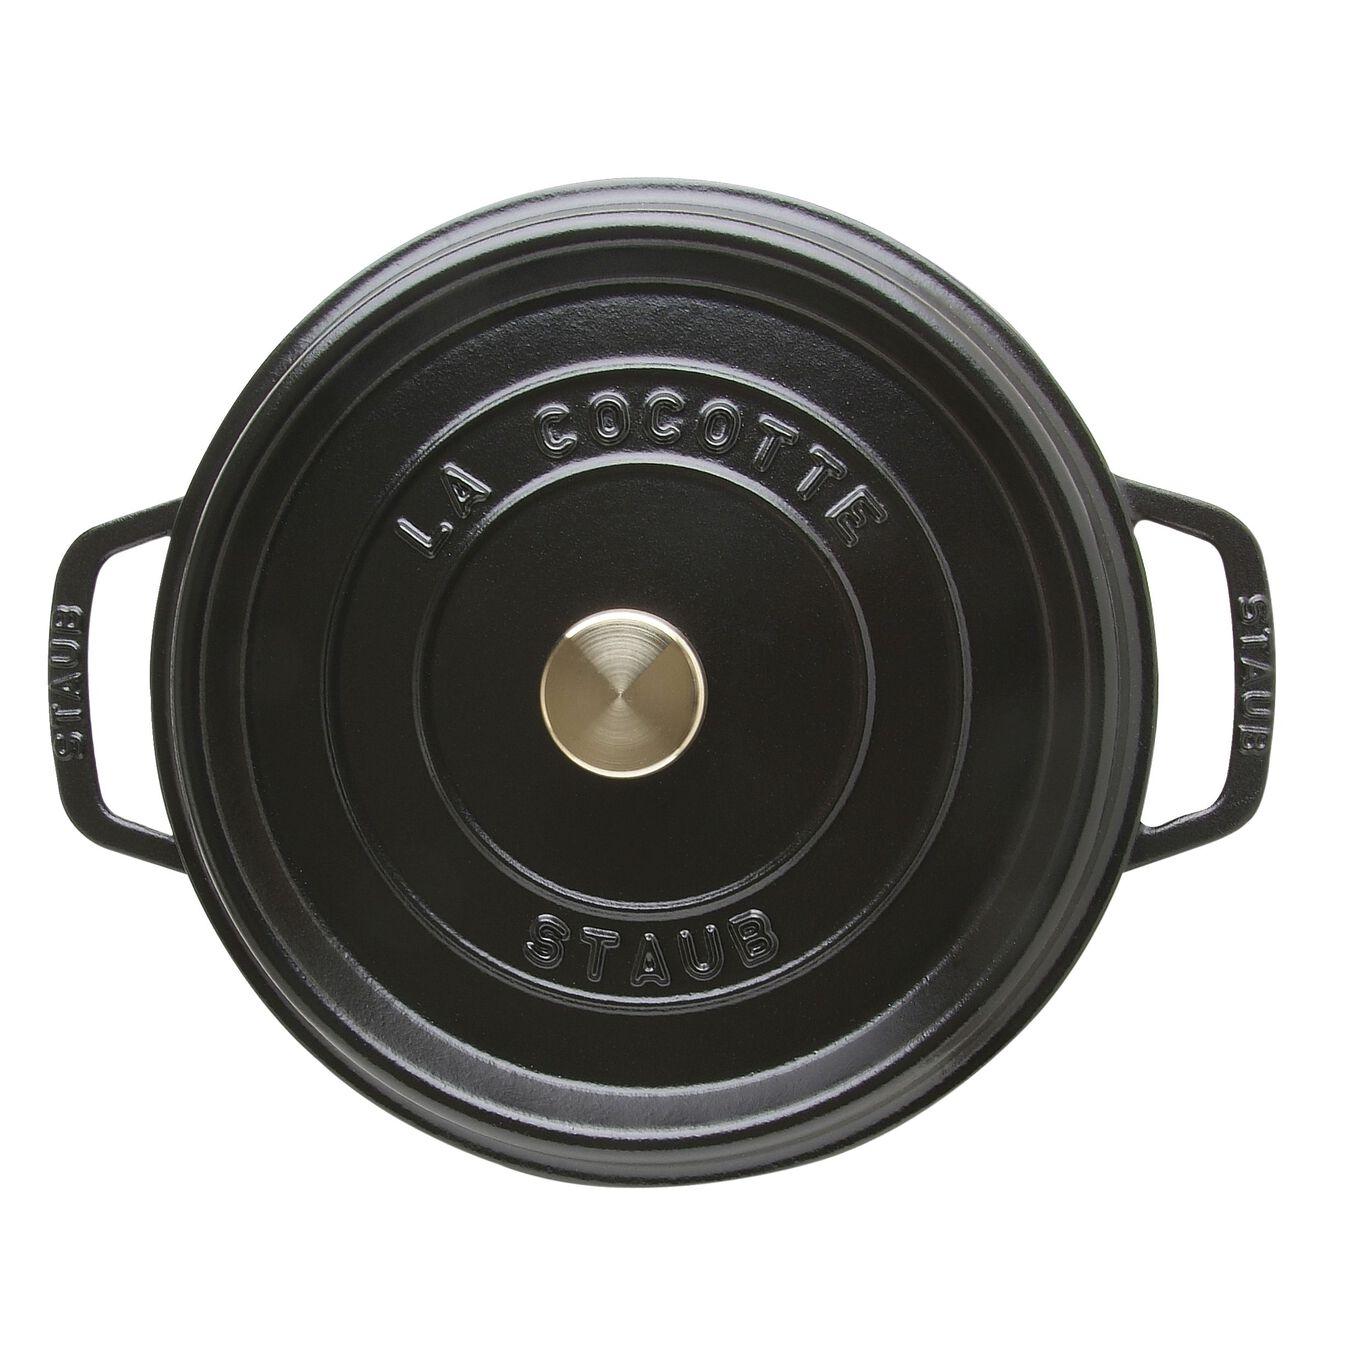 Döküm Tencere | Siyah | 24 cm | 3,8 l | yuvarlak,,large 4